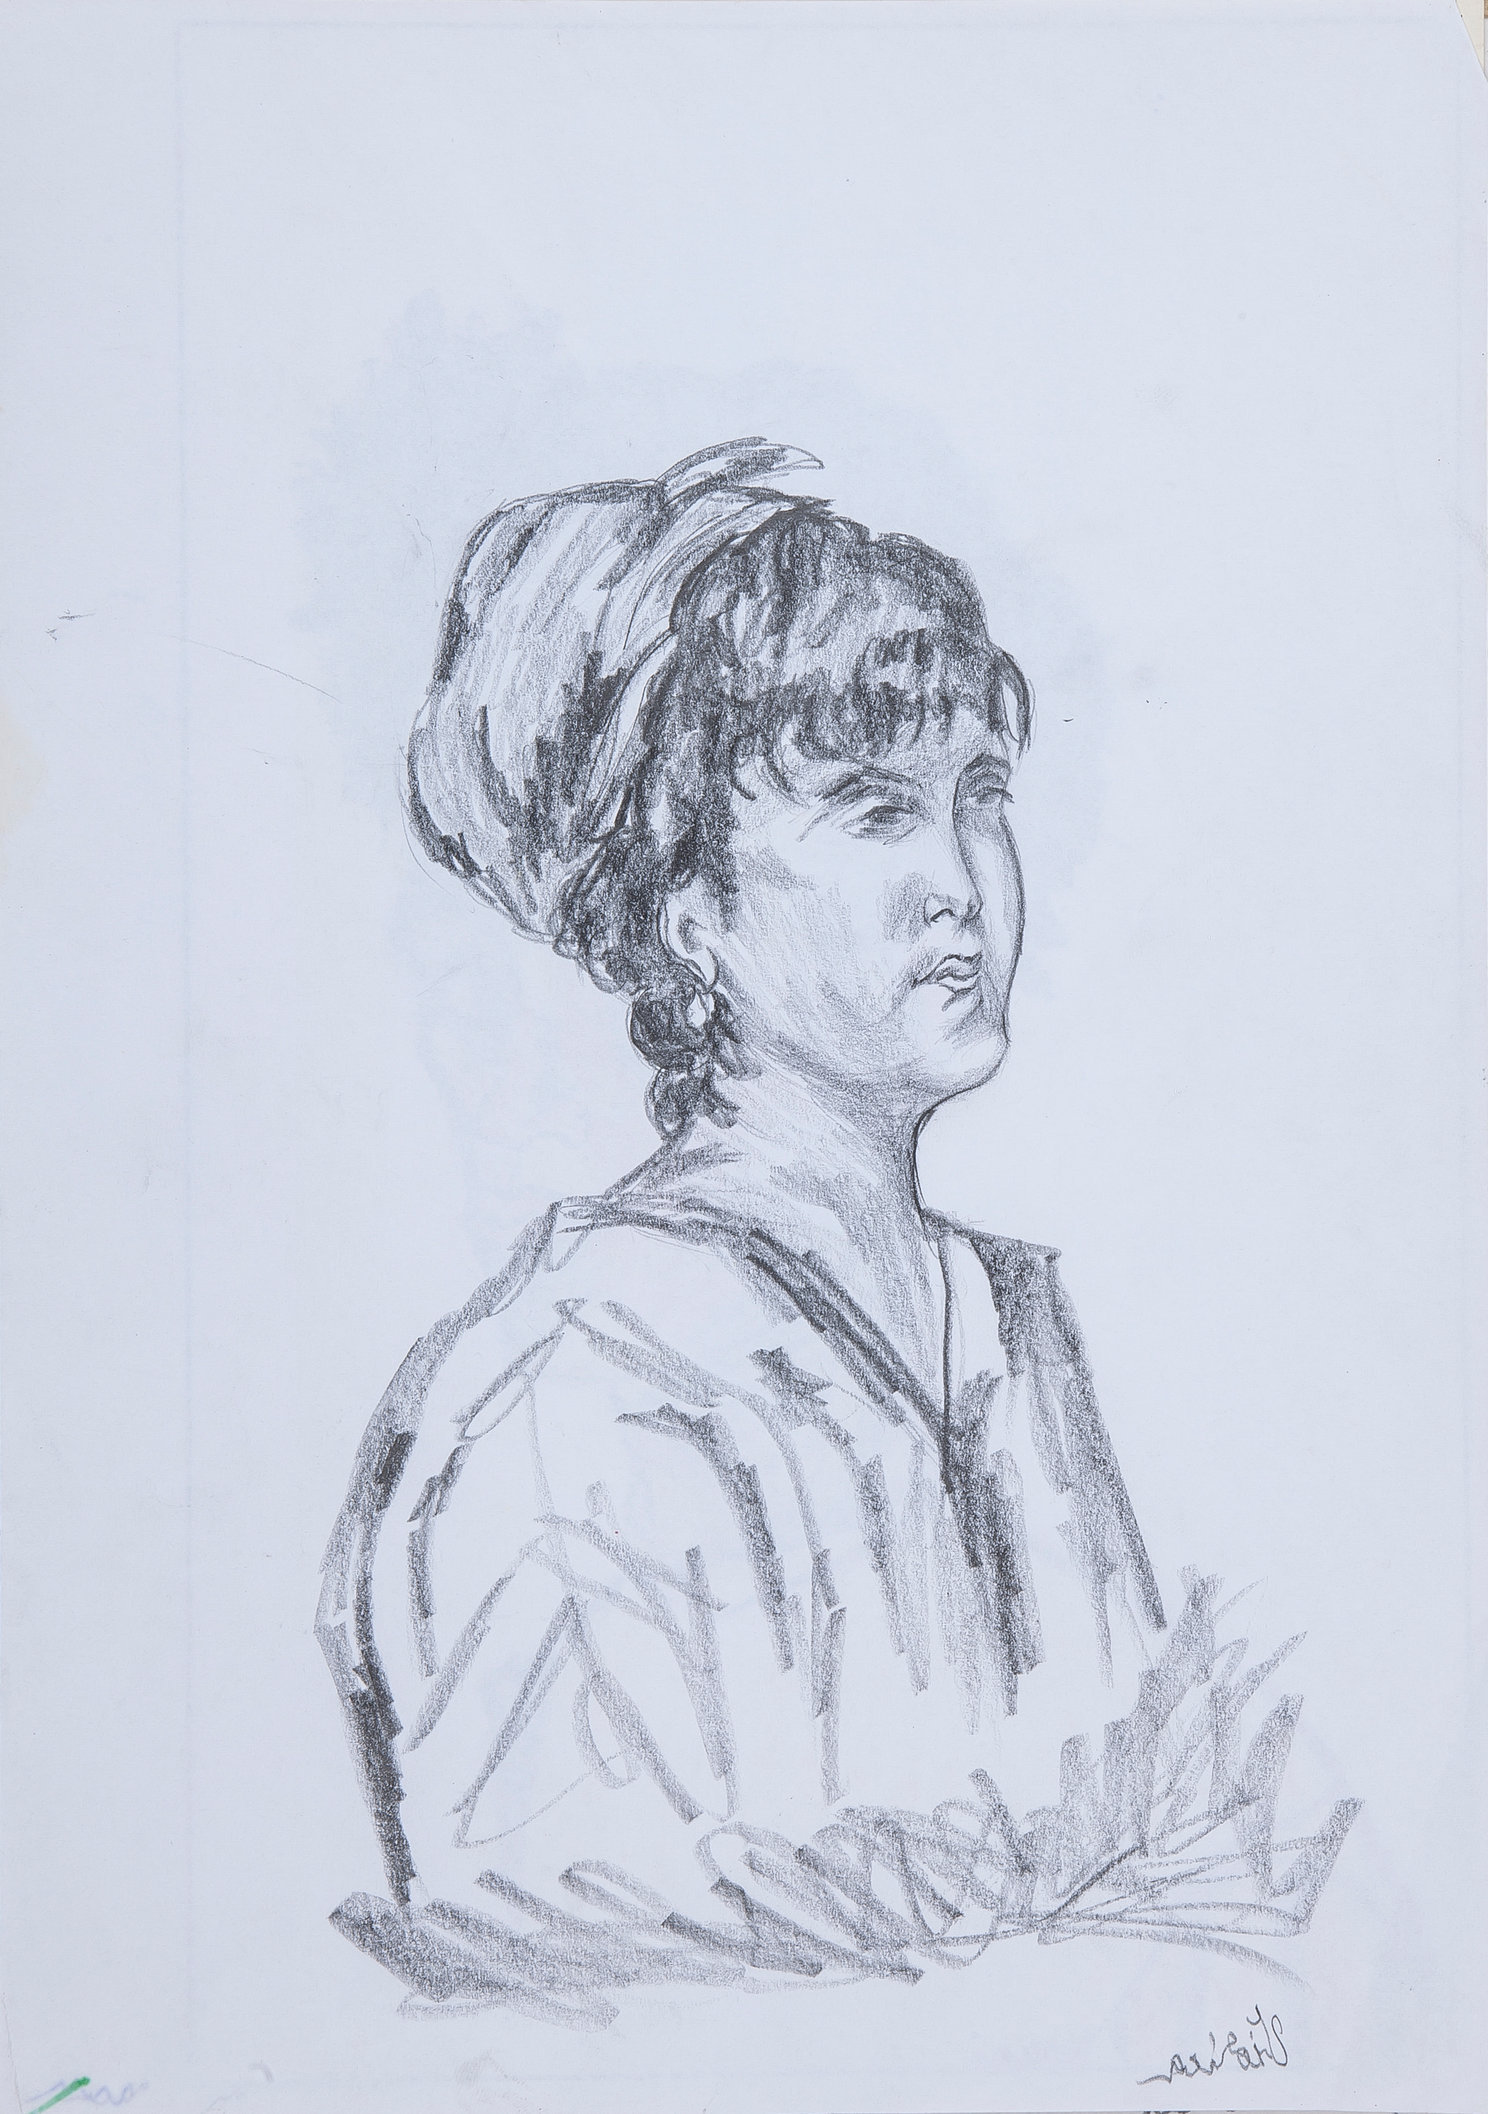 Woman 3 - Study (Left Hand Made)